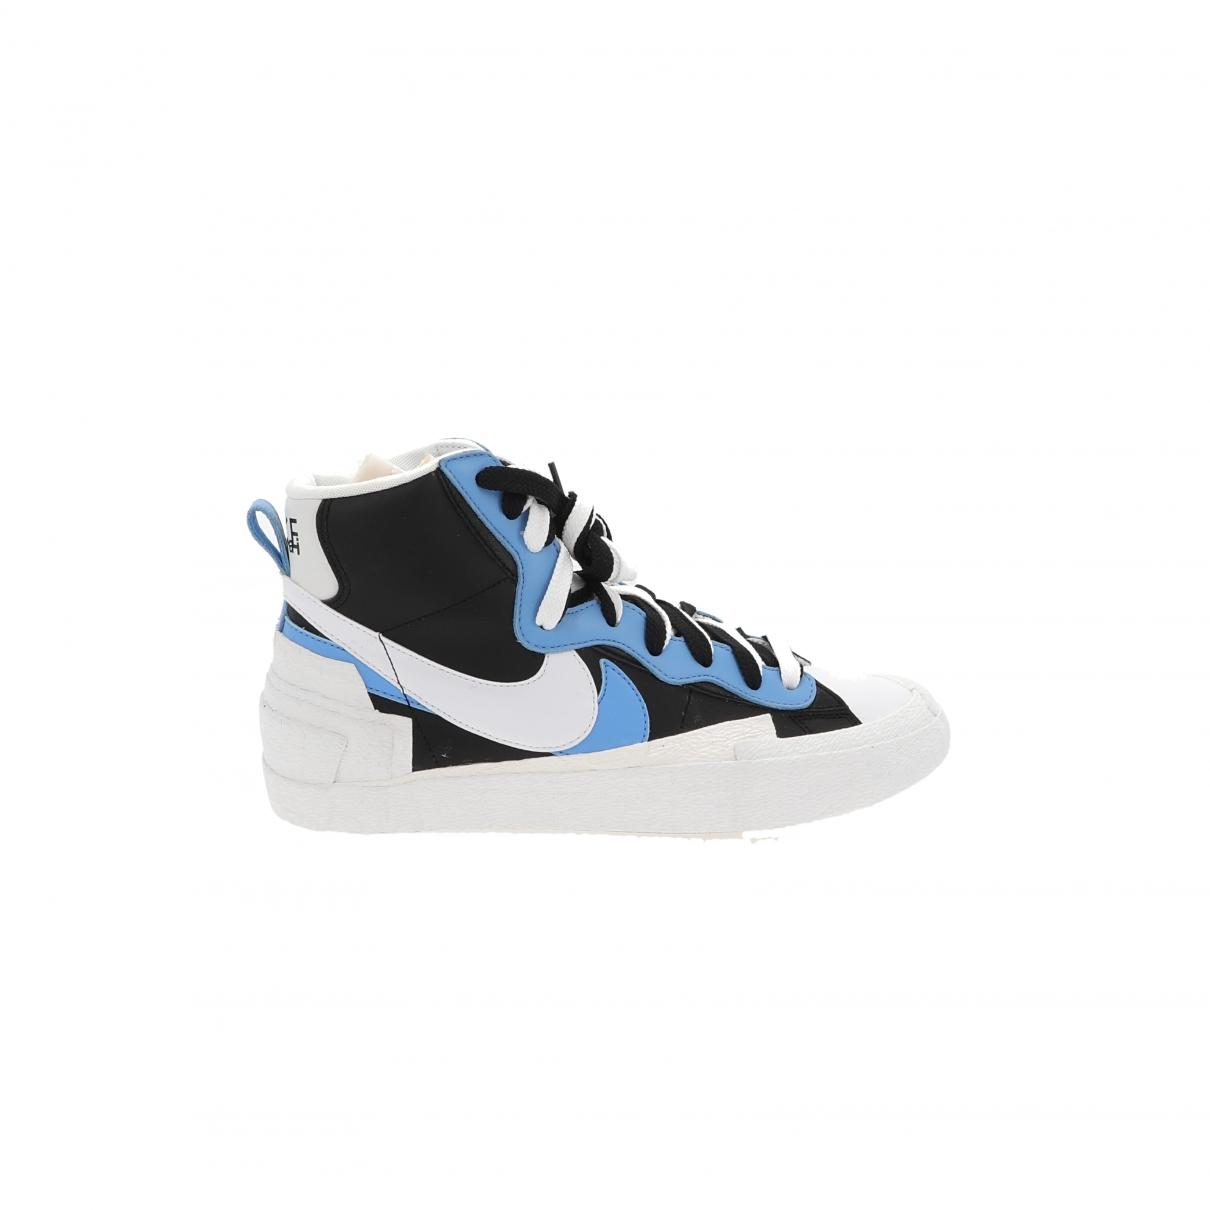 Nike X Sacai - Baskets Blazer Mid pour homme en cuir - bleu